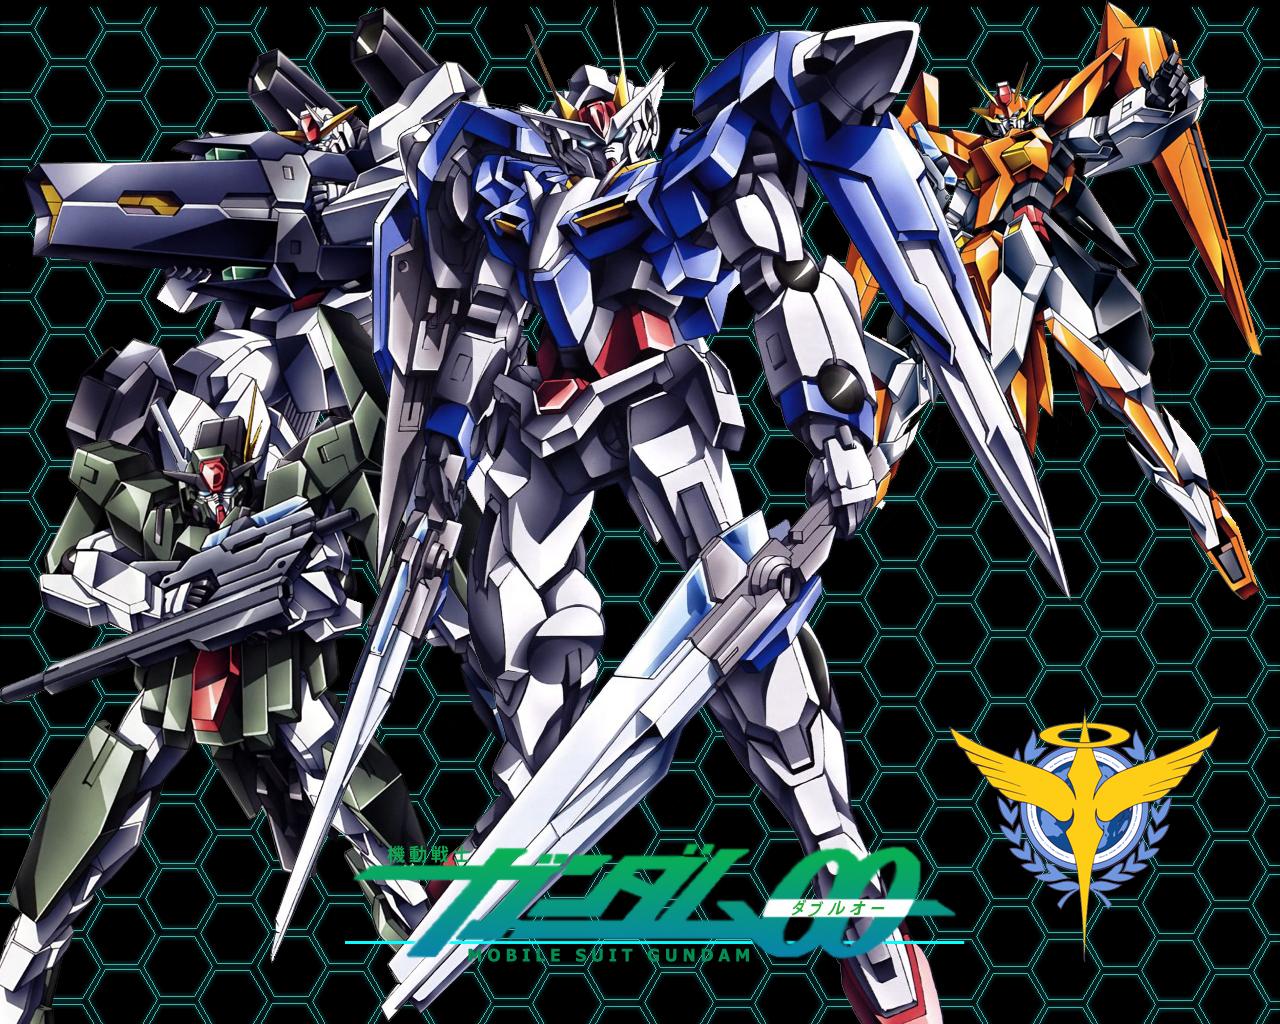 http://3.bp.blogspot.com/-6JyntZNQHoM/TfzVutAEjFI/AAAAAAAAAFo/o1wcGK3B3H4/s1600/Gundam_00_Season_2_Wallpaper_by_shinigami117.jpg